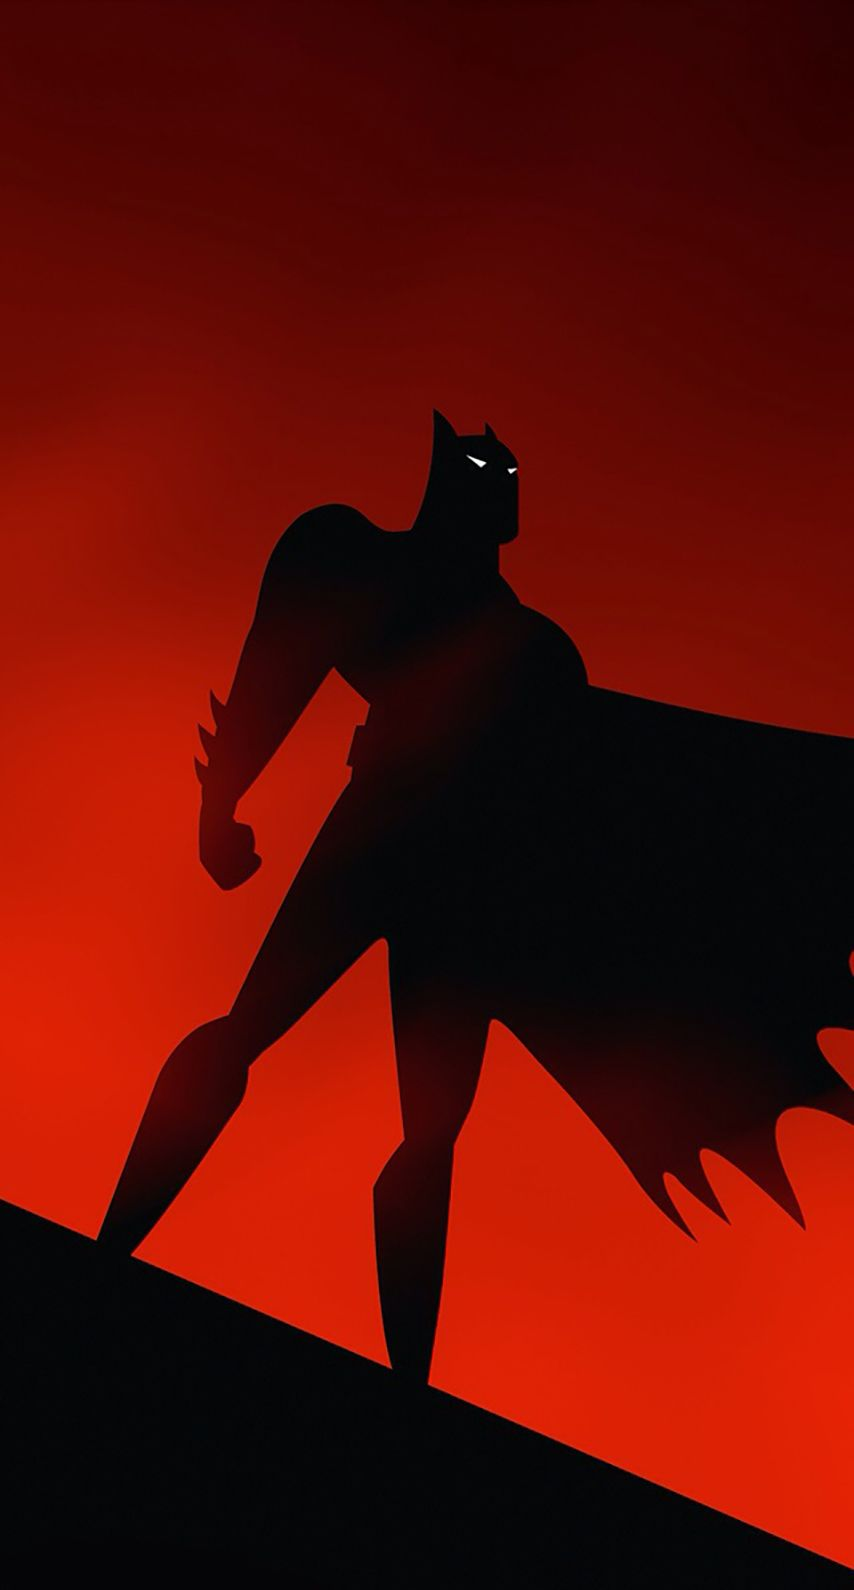 The Best Batman Batman Cartoon Batman Silhouette Batman Artwork